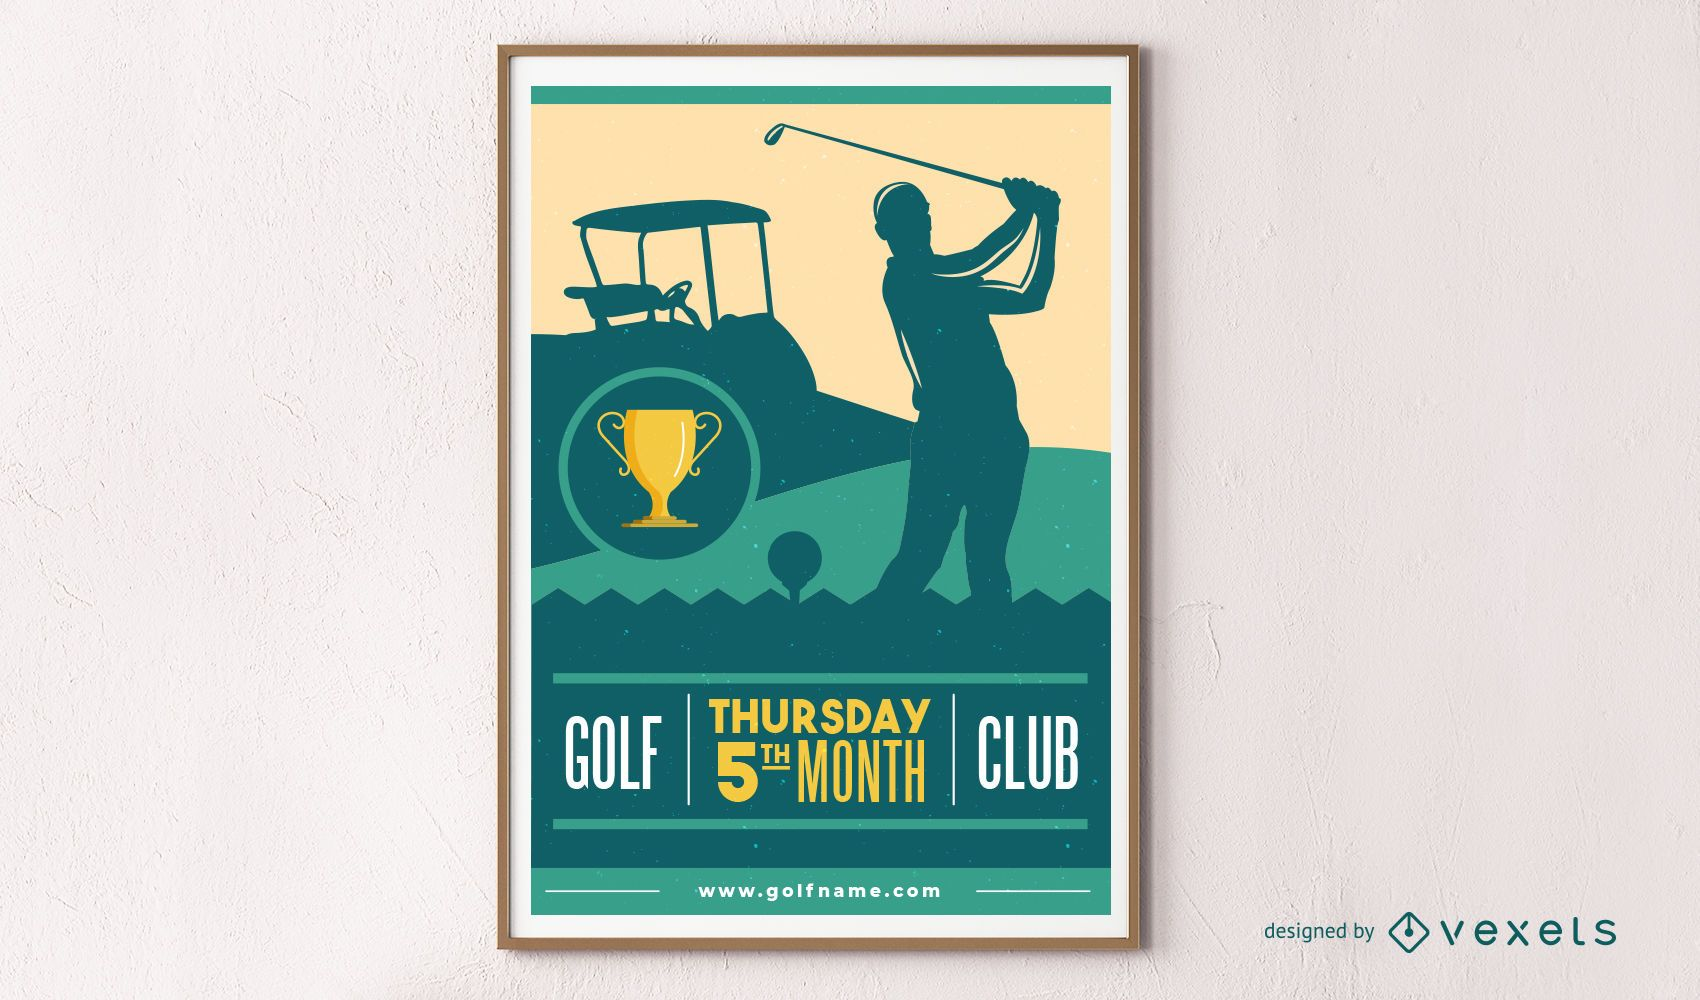 Golf Silhouette Poster Design